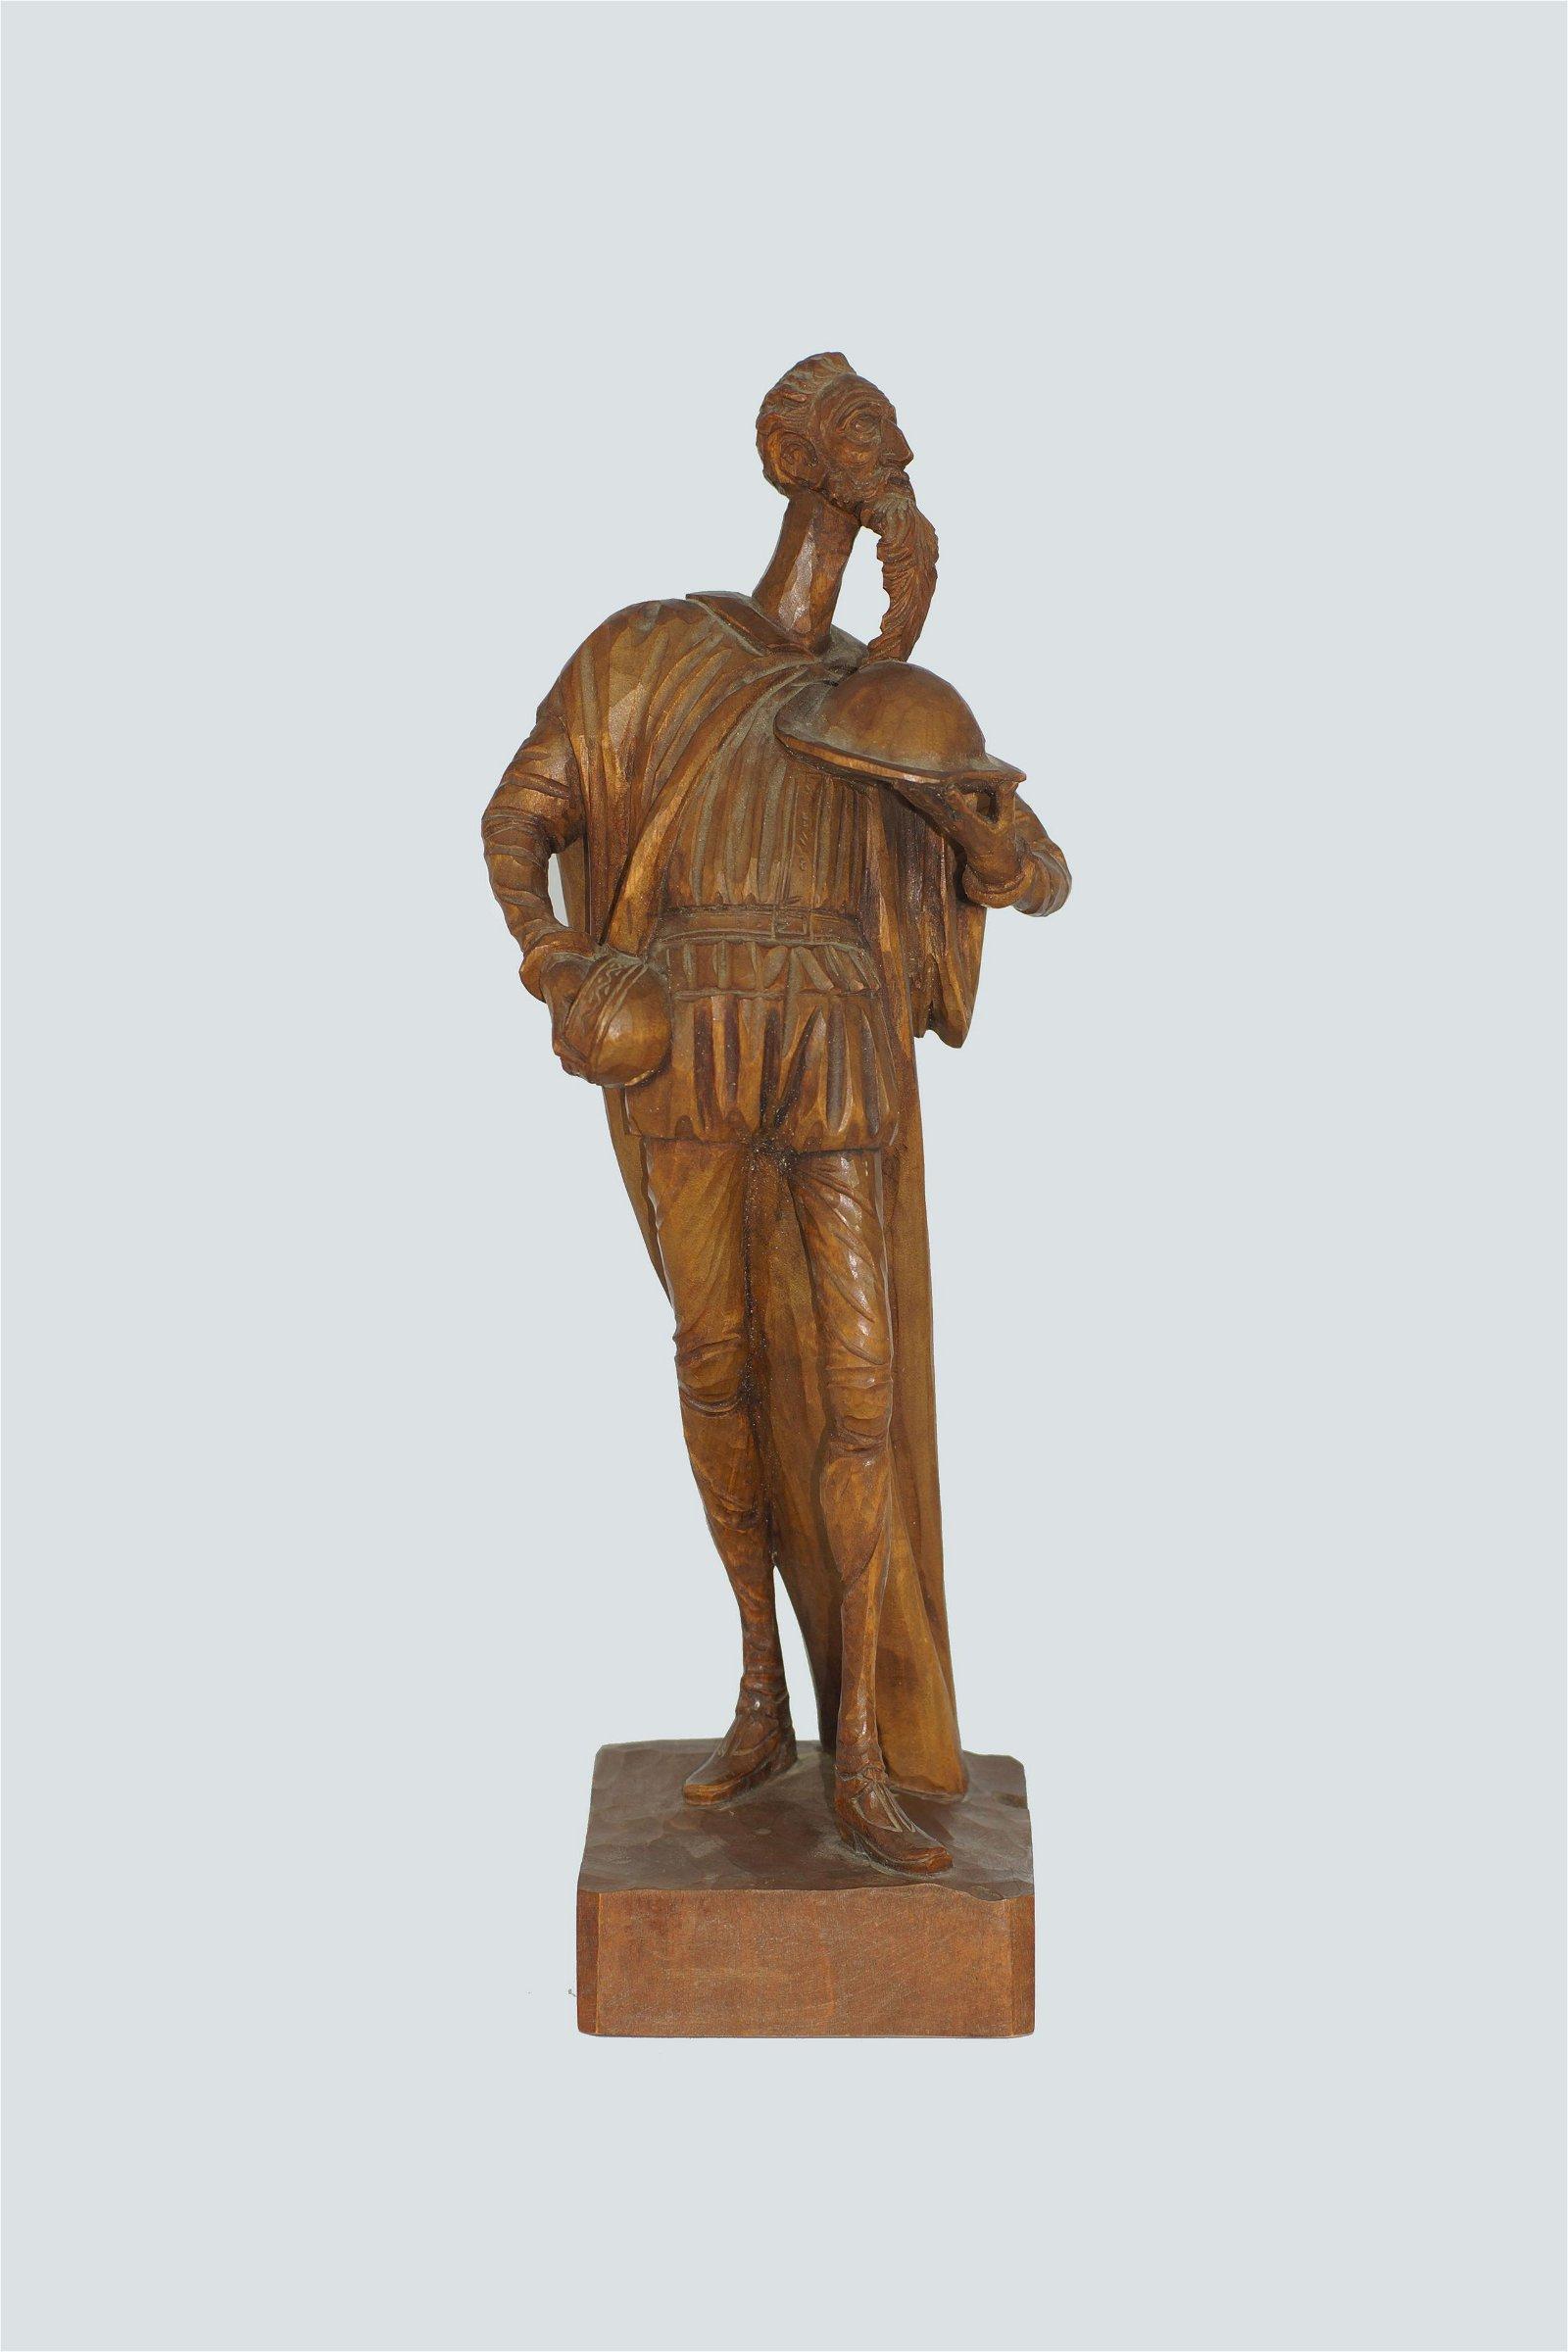 Antique Carved wood Don Quixote Sculpture